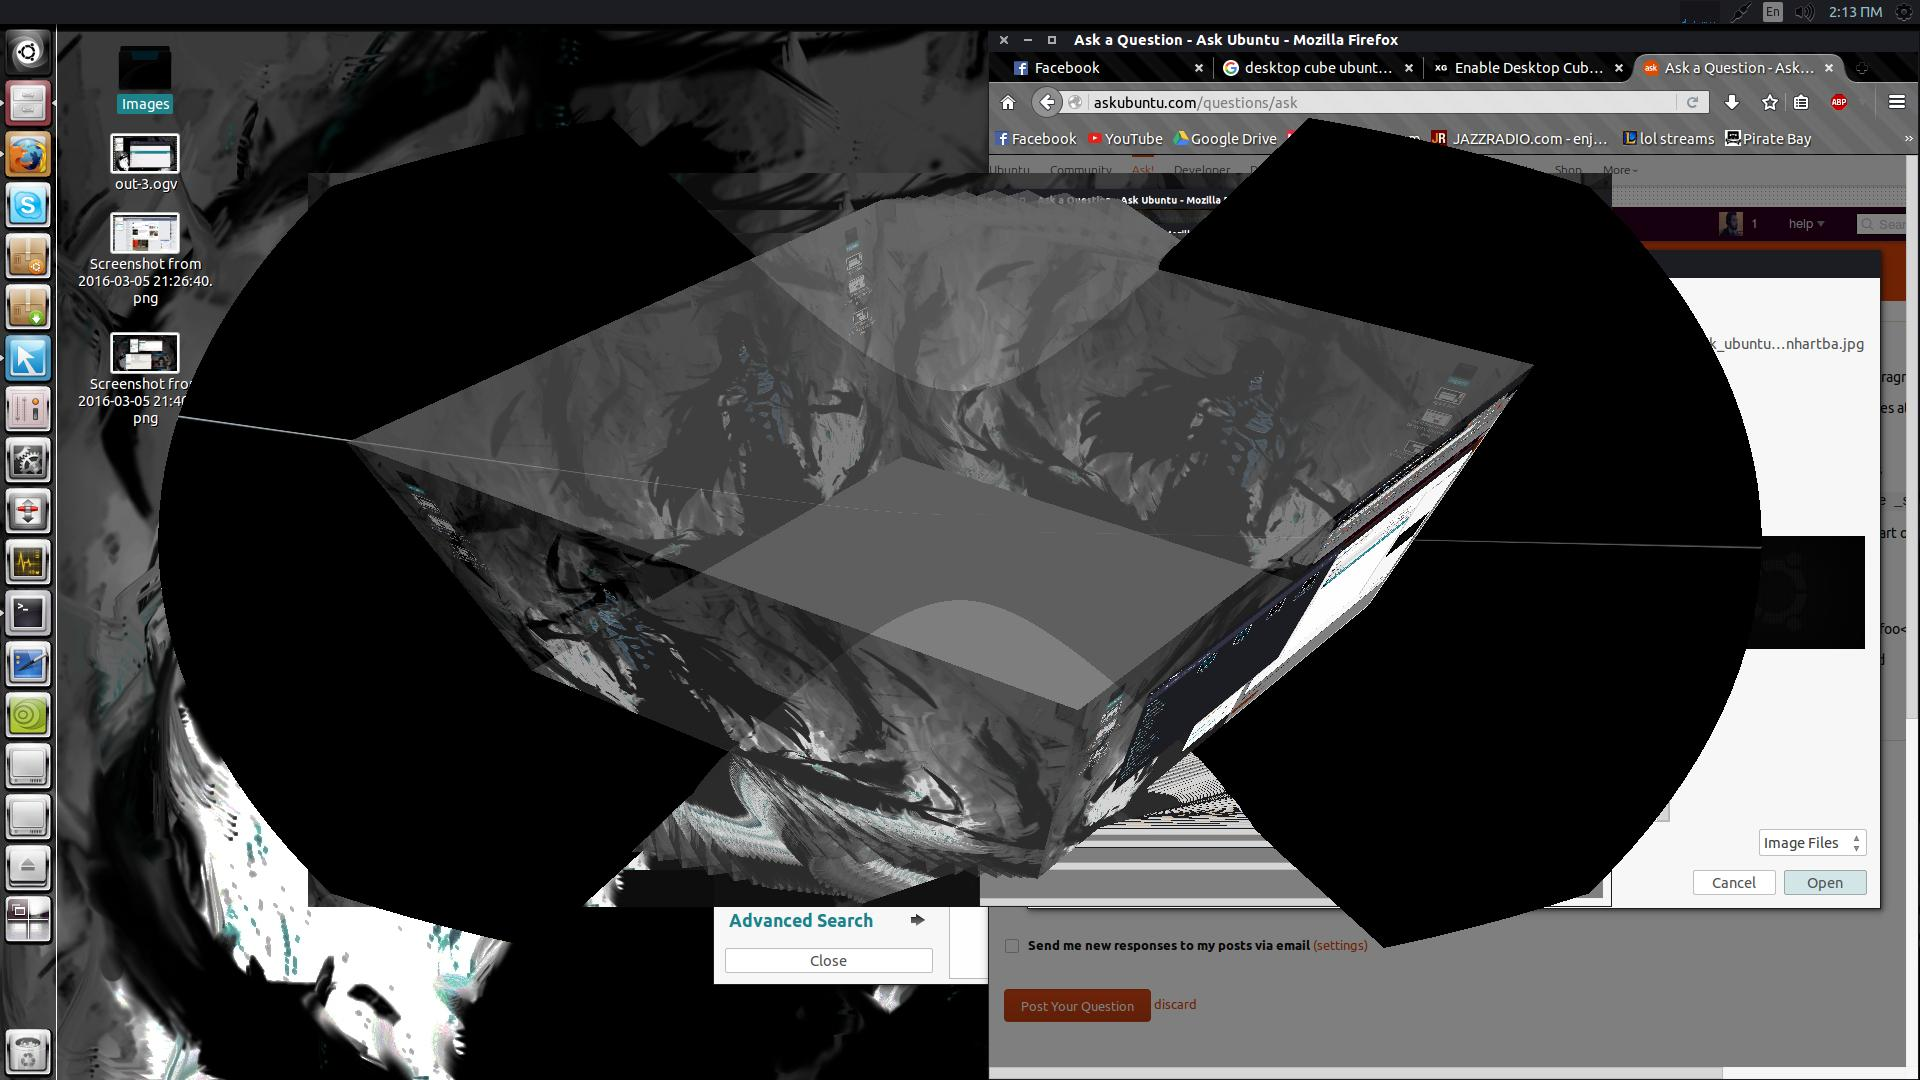 graphics - Graphical problem with desktop cube, Ubuntu 14.04.4 - Ask ...